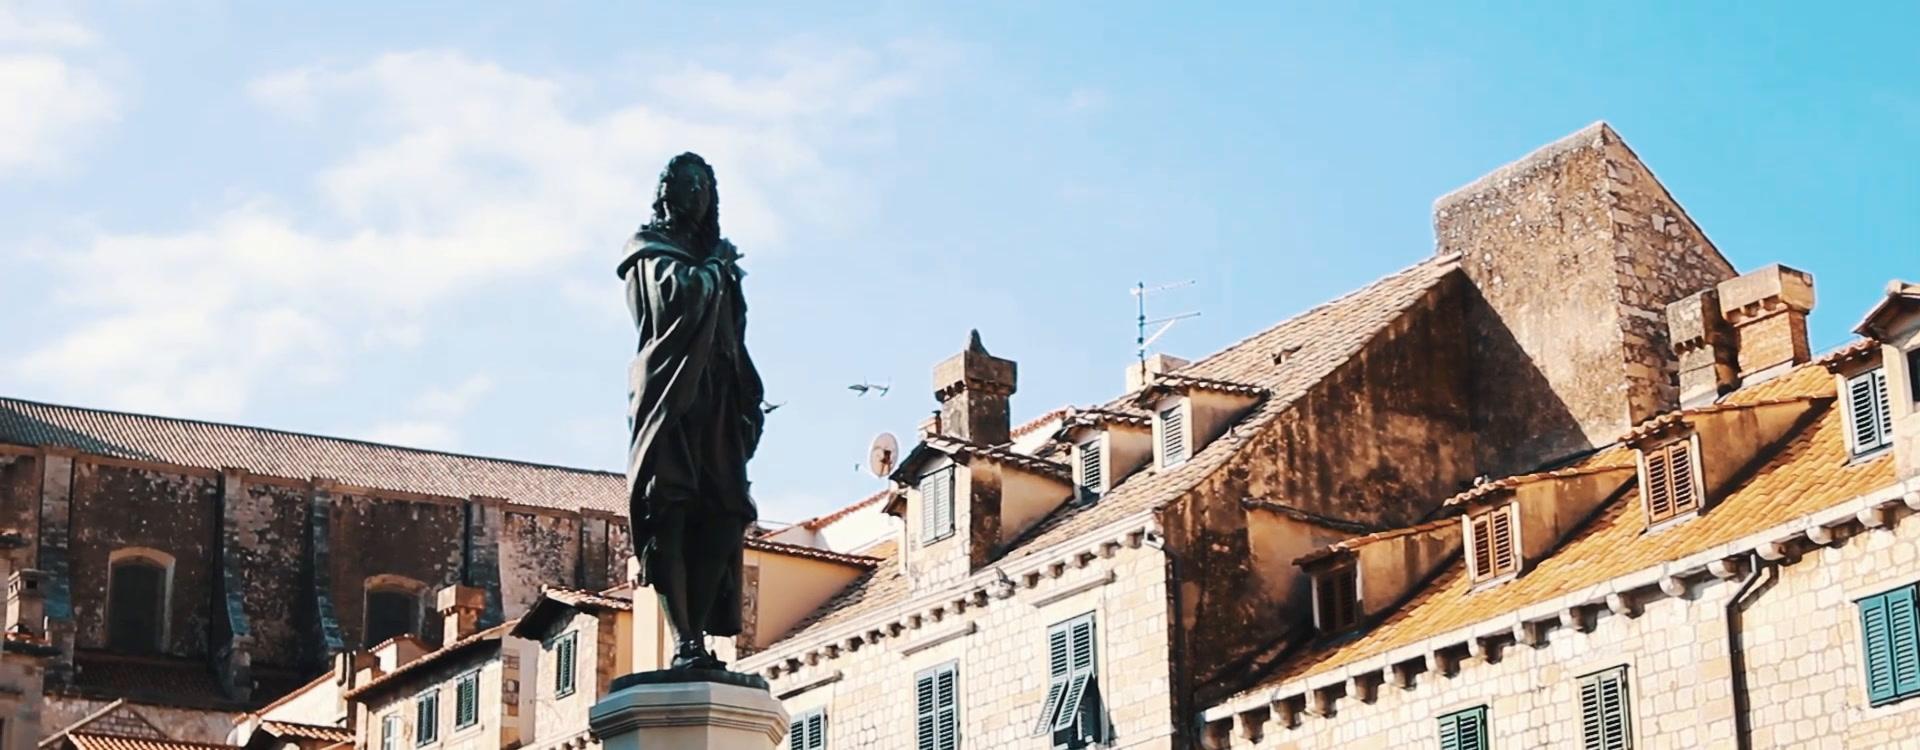 Caroline + Jonas | Dubrovnik, Croatia | St. Lawrence fort